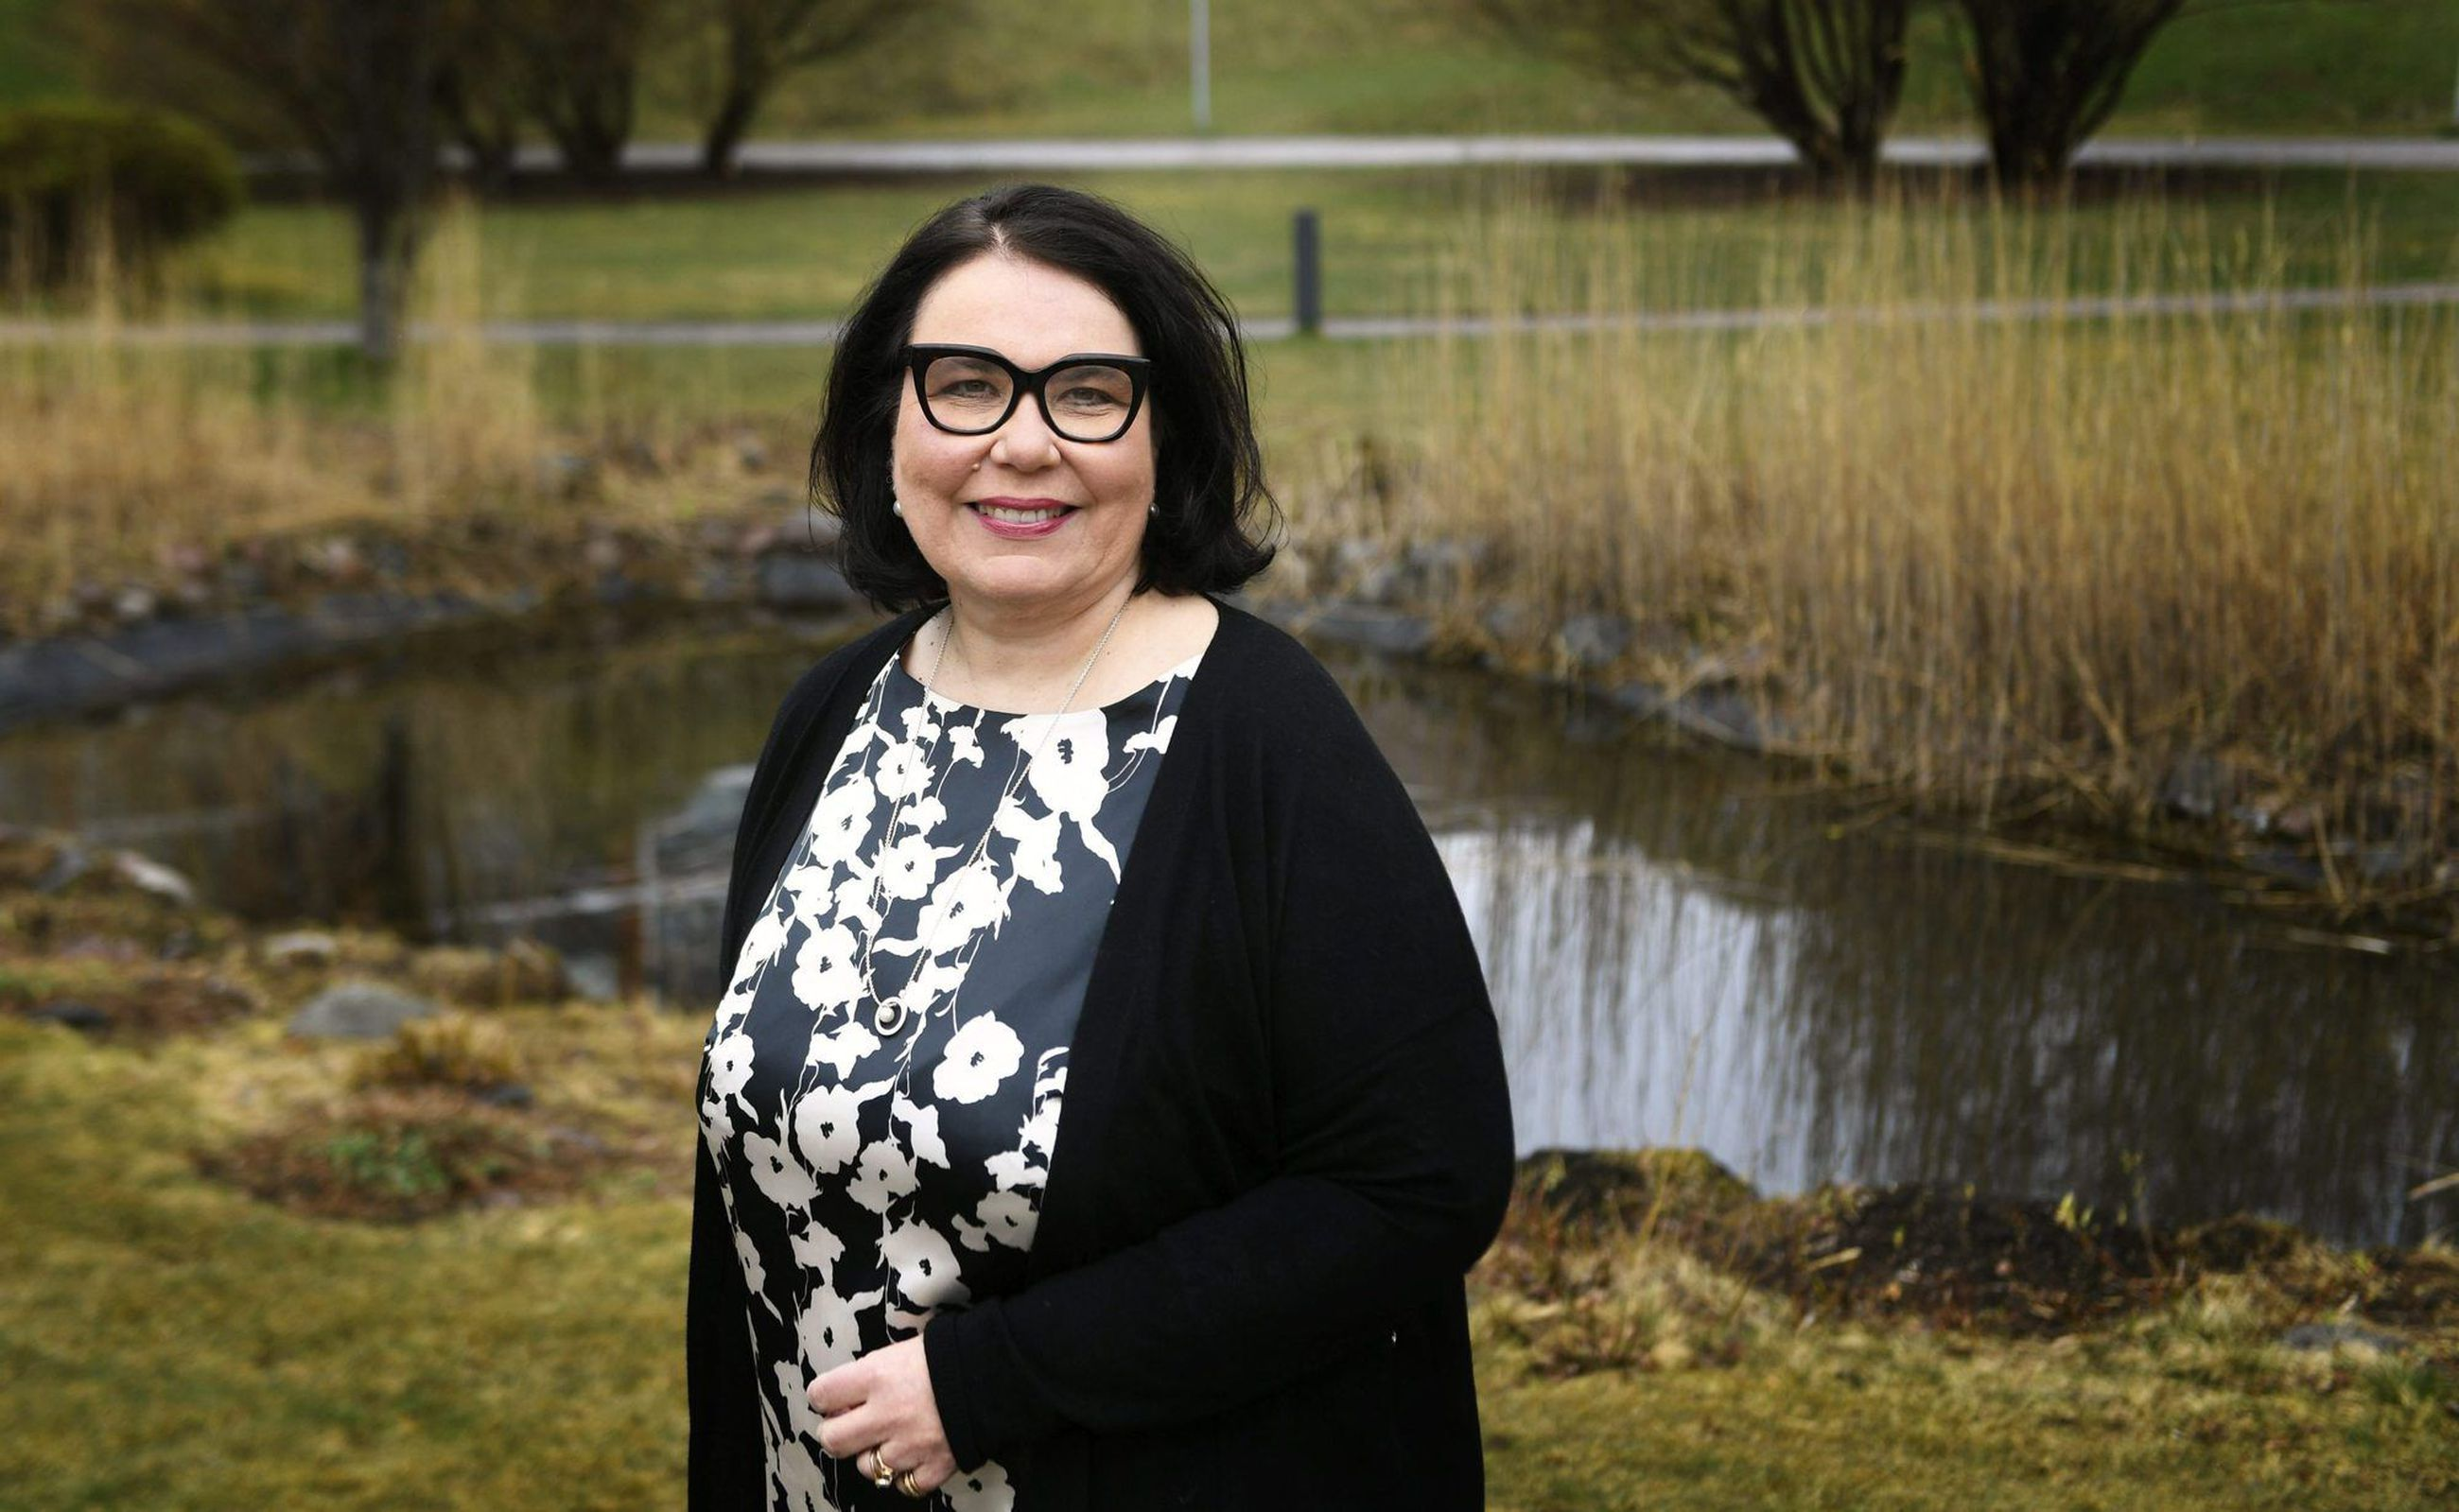 Merja Ylä Anttila